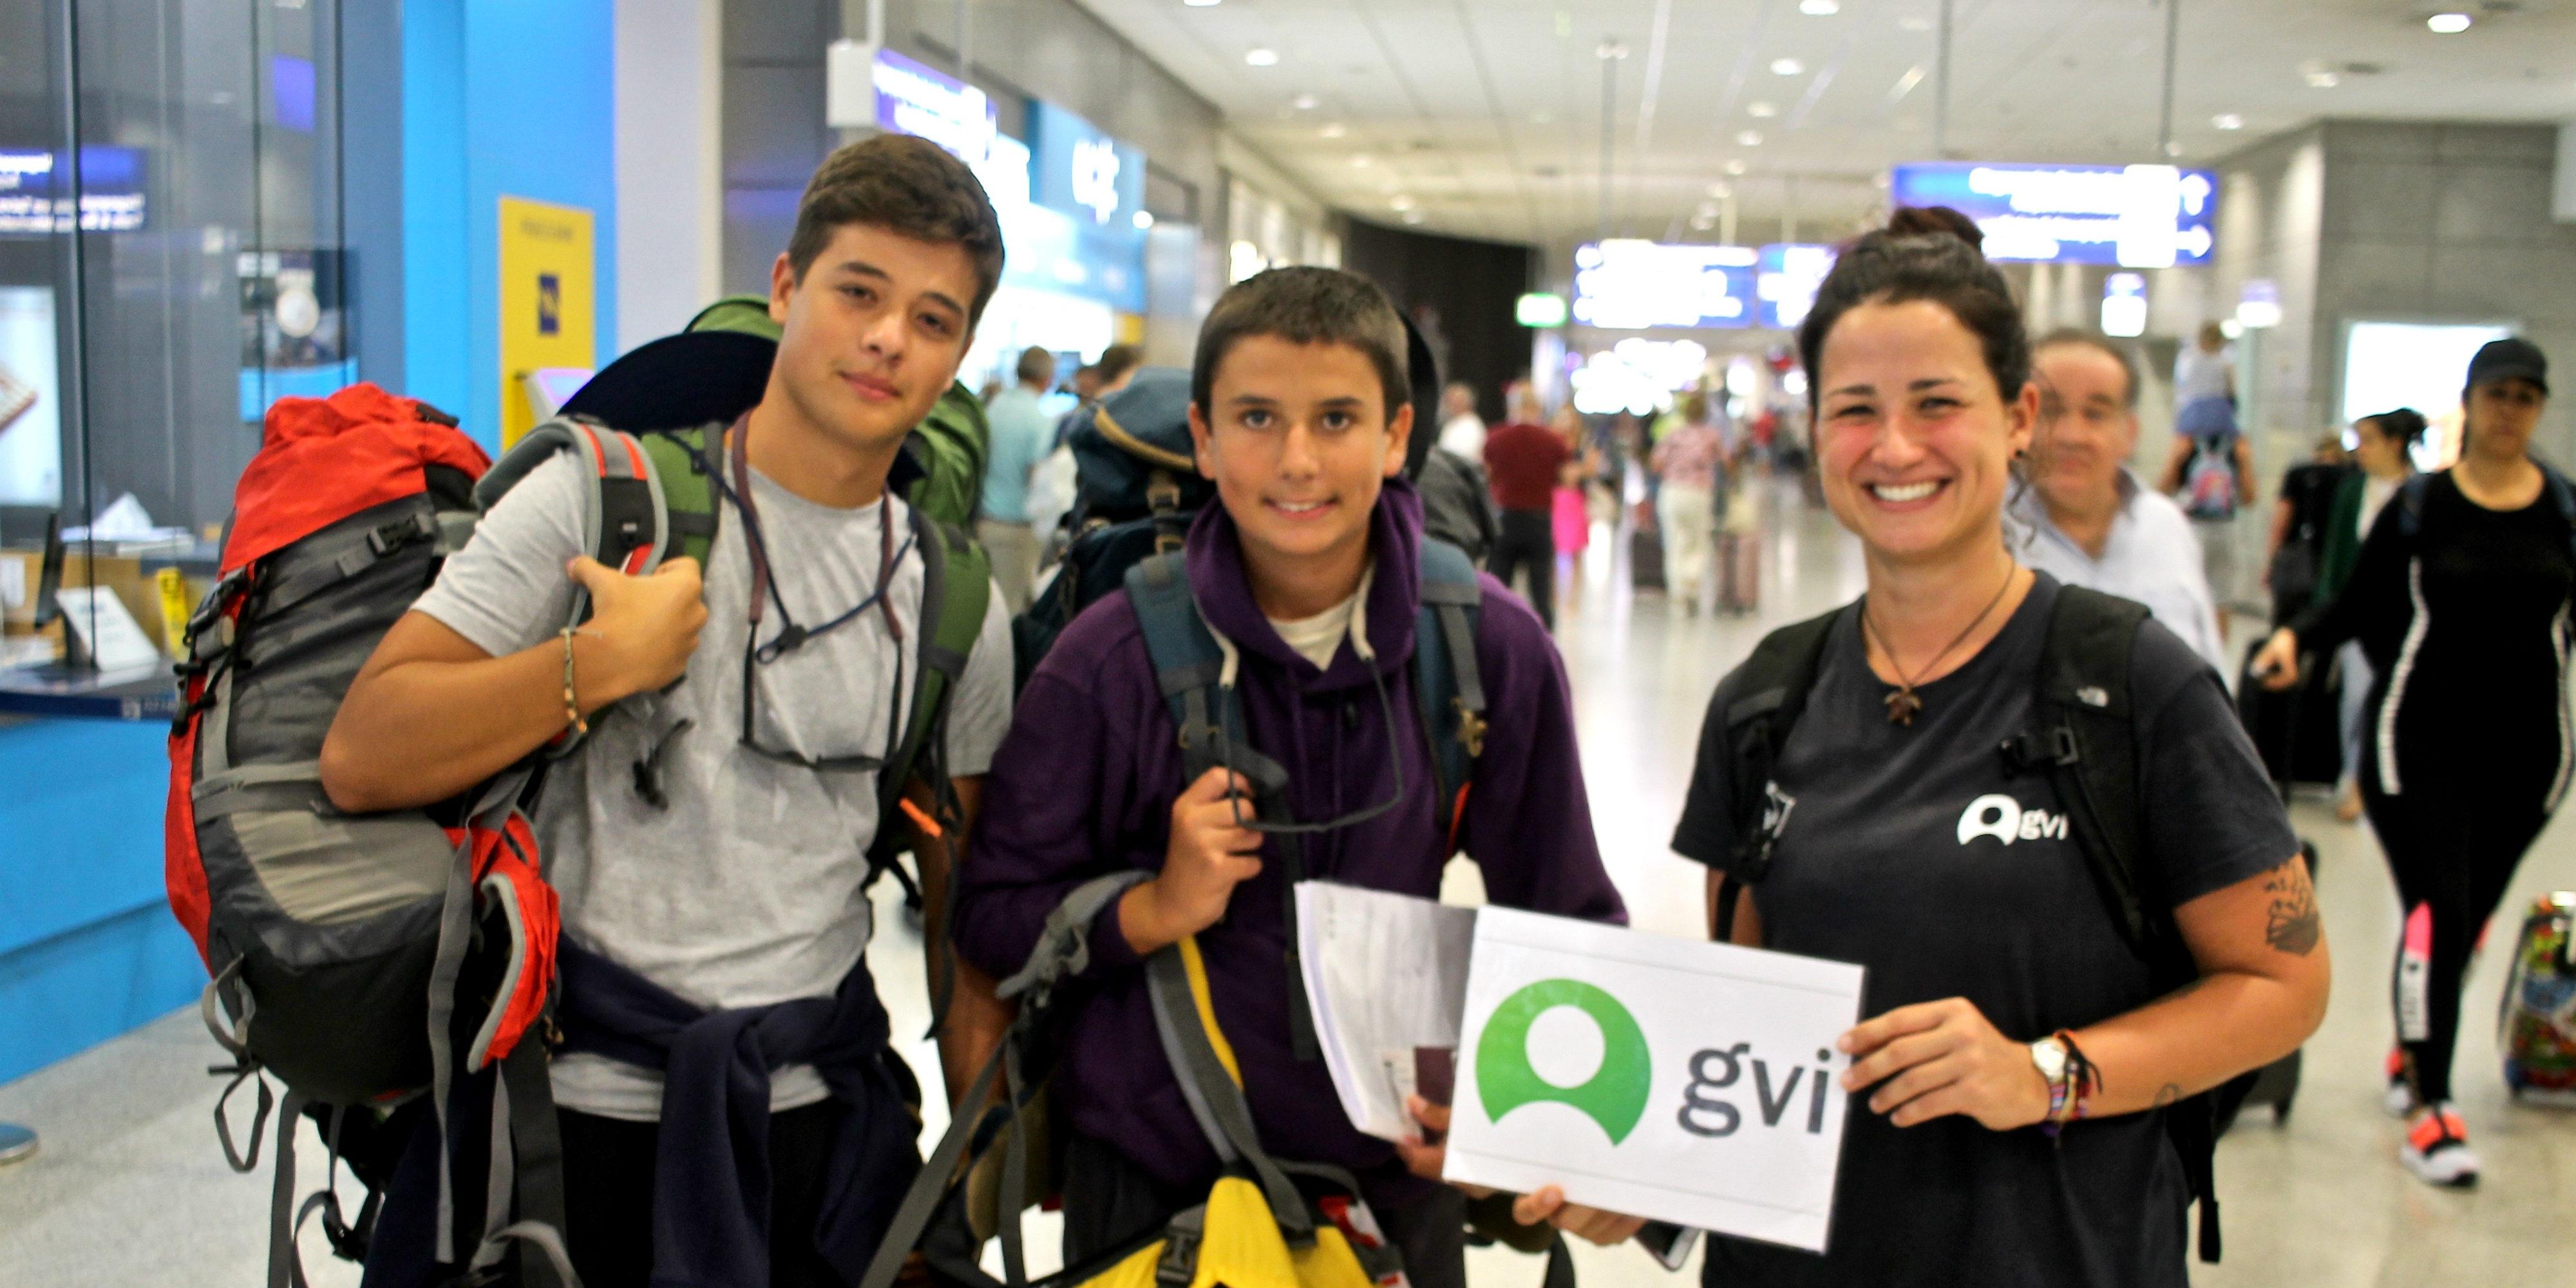 Volunteering Abroad as a Teenager